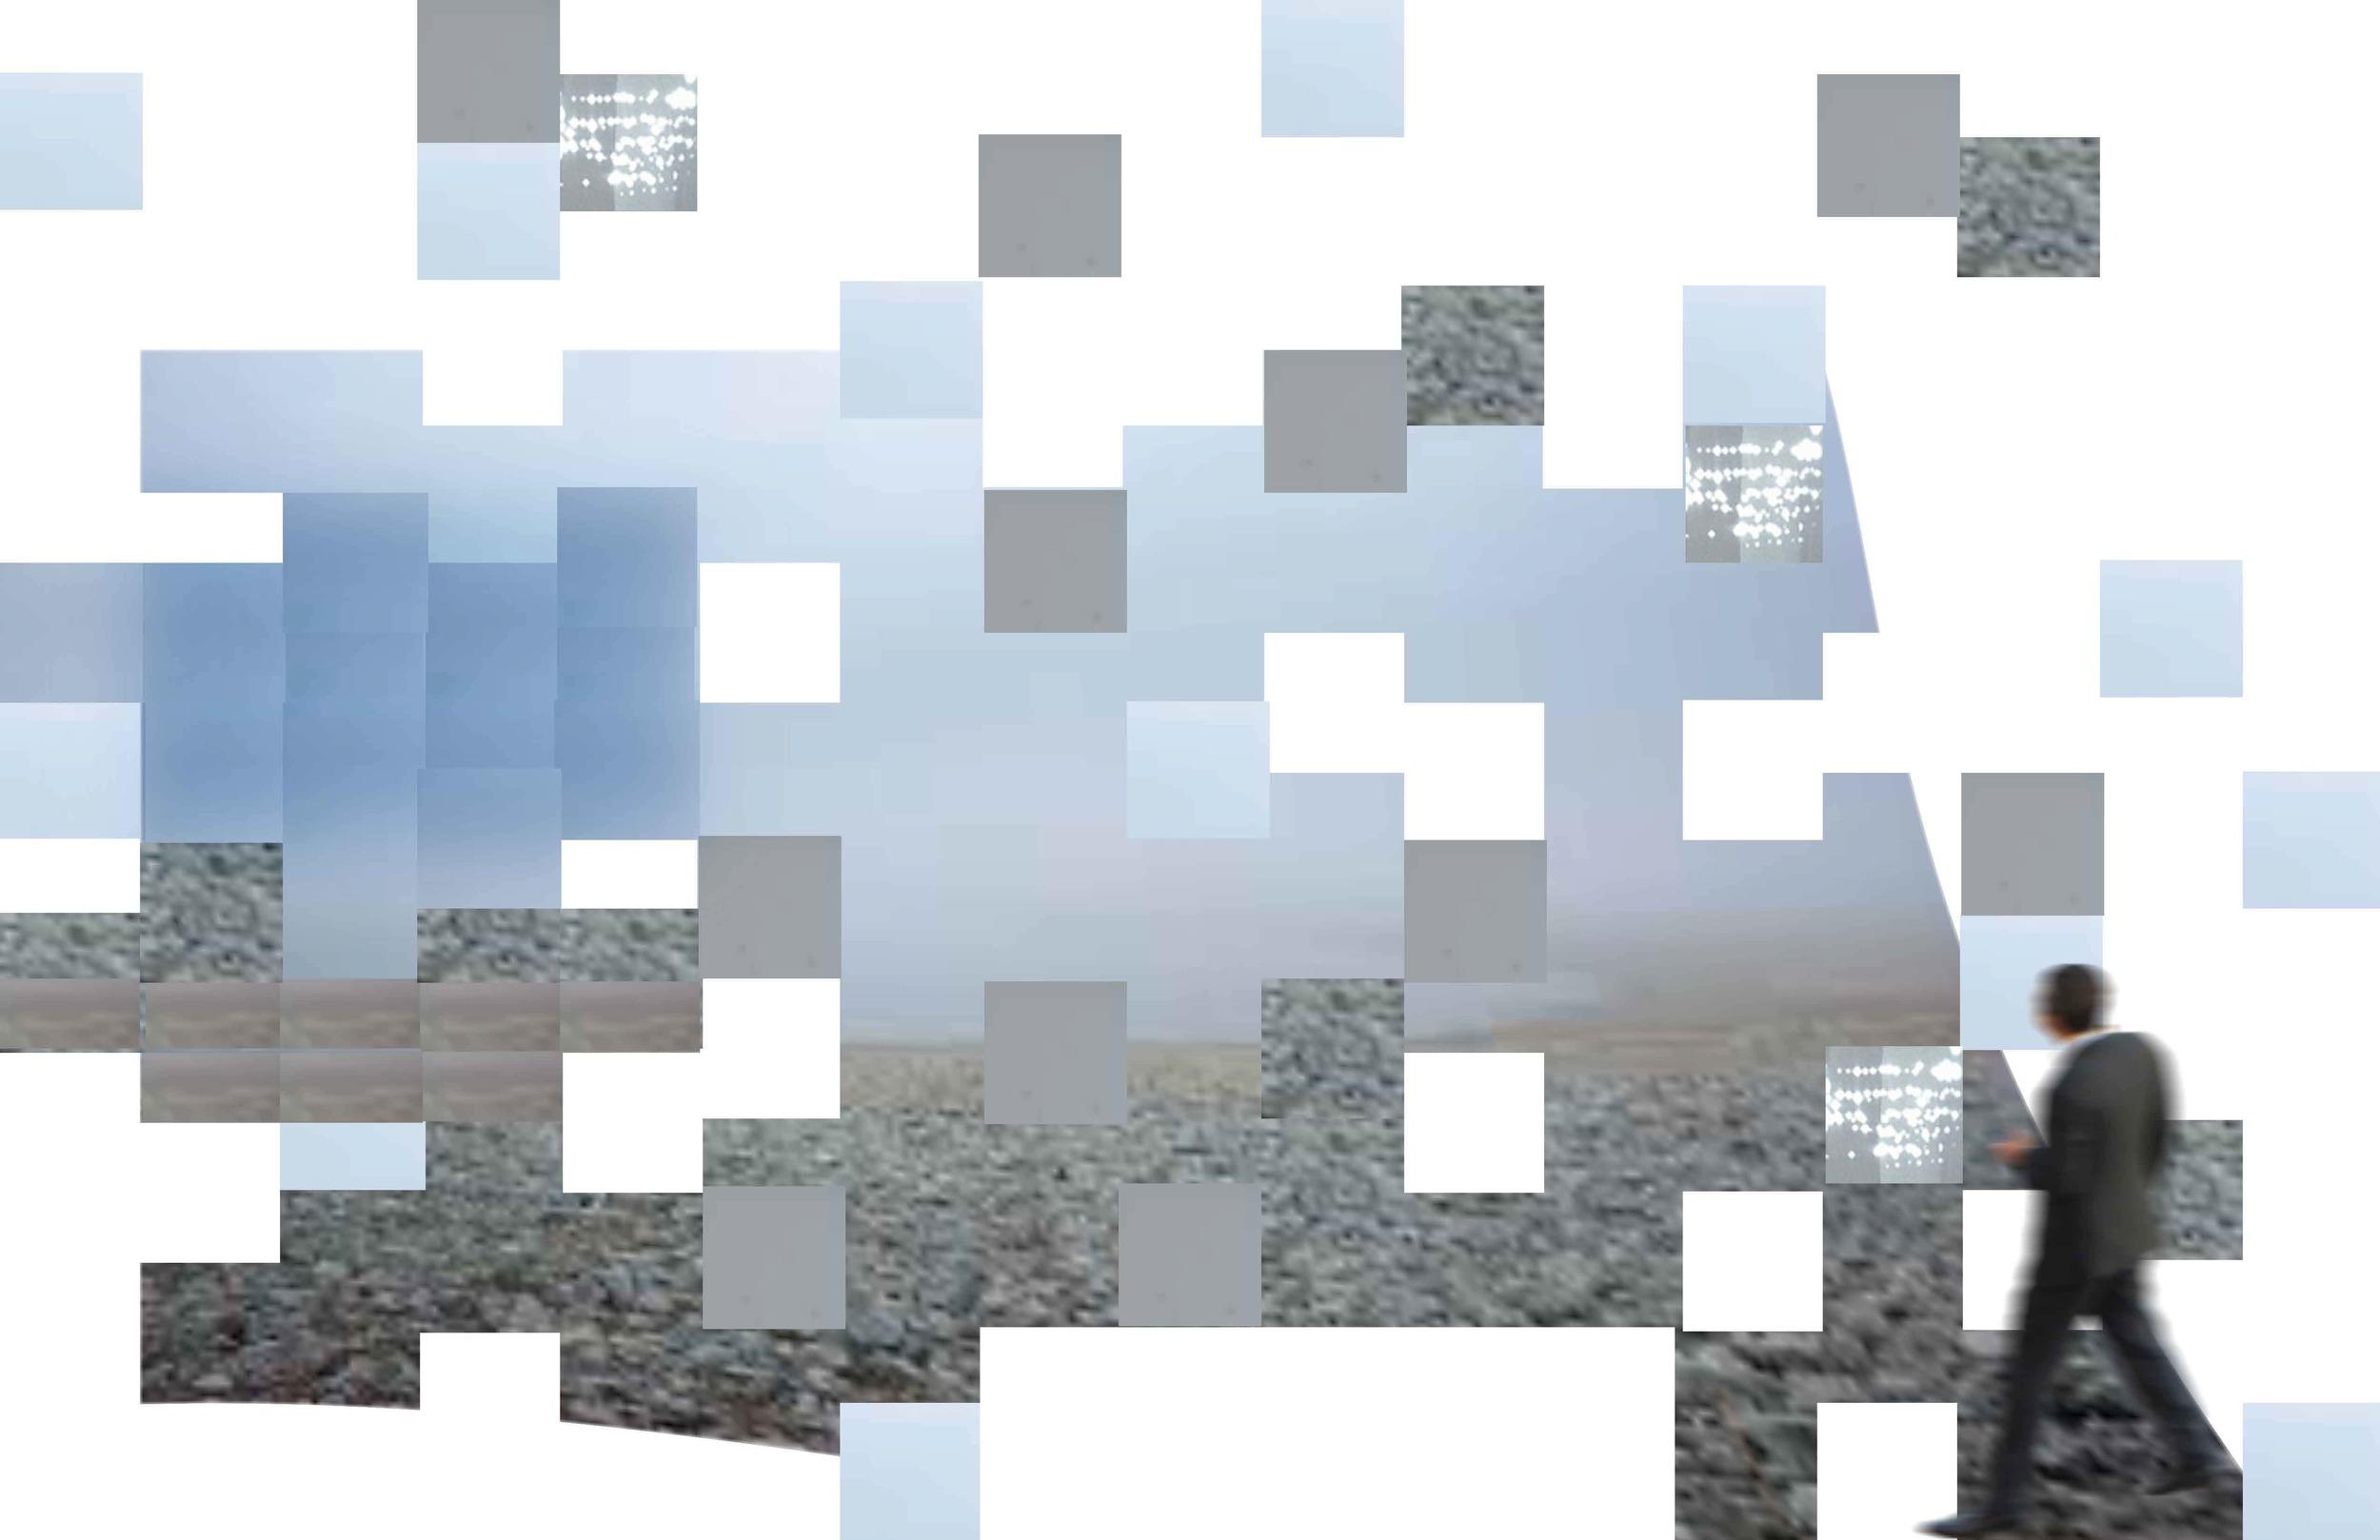 IDEOGRAM_PIXELS NEW FINAL.jpg